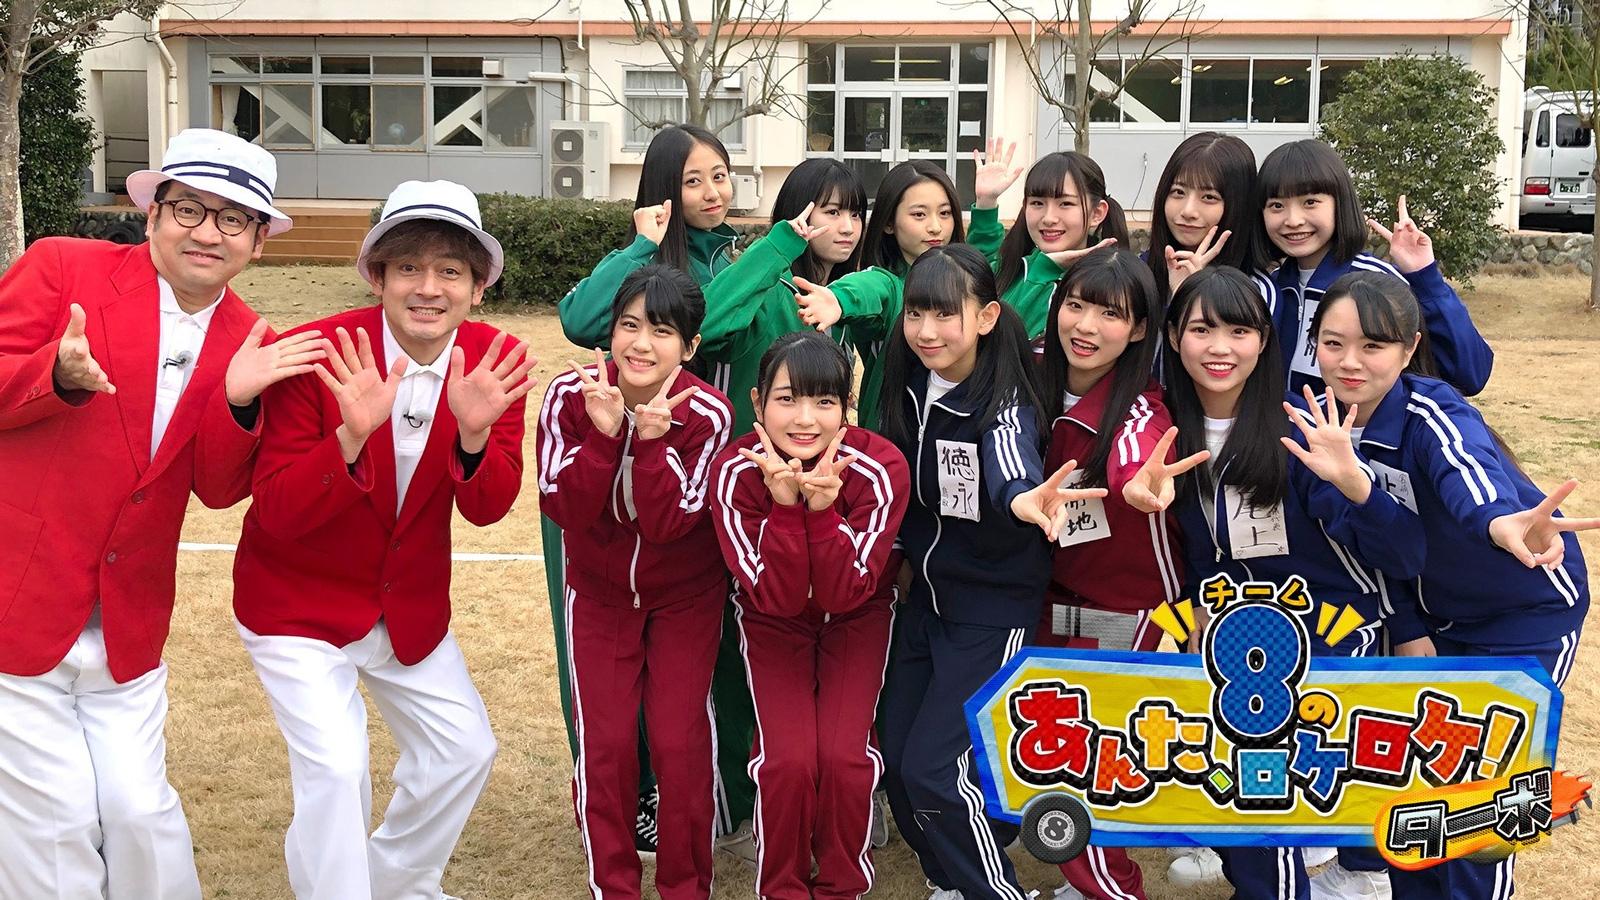 AKB48チーム8のあんた、ロケロケ! ターボ #51 動画 2020年5月22日 200522